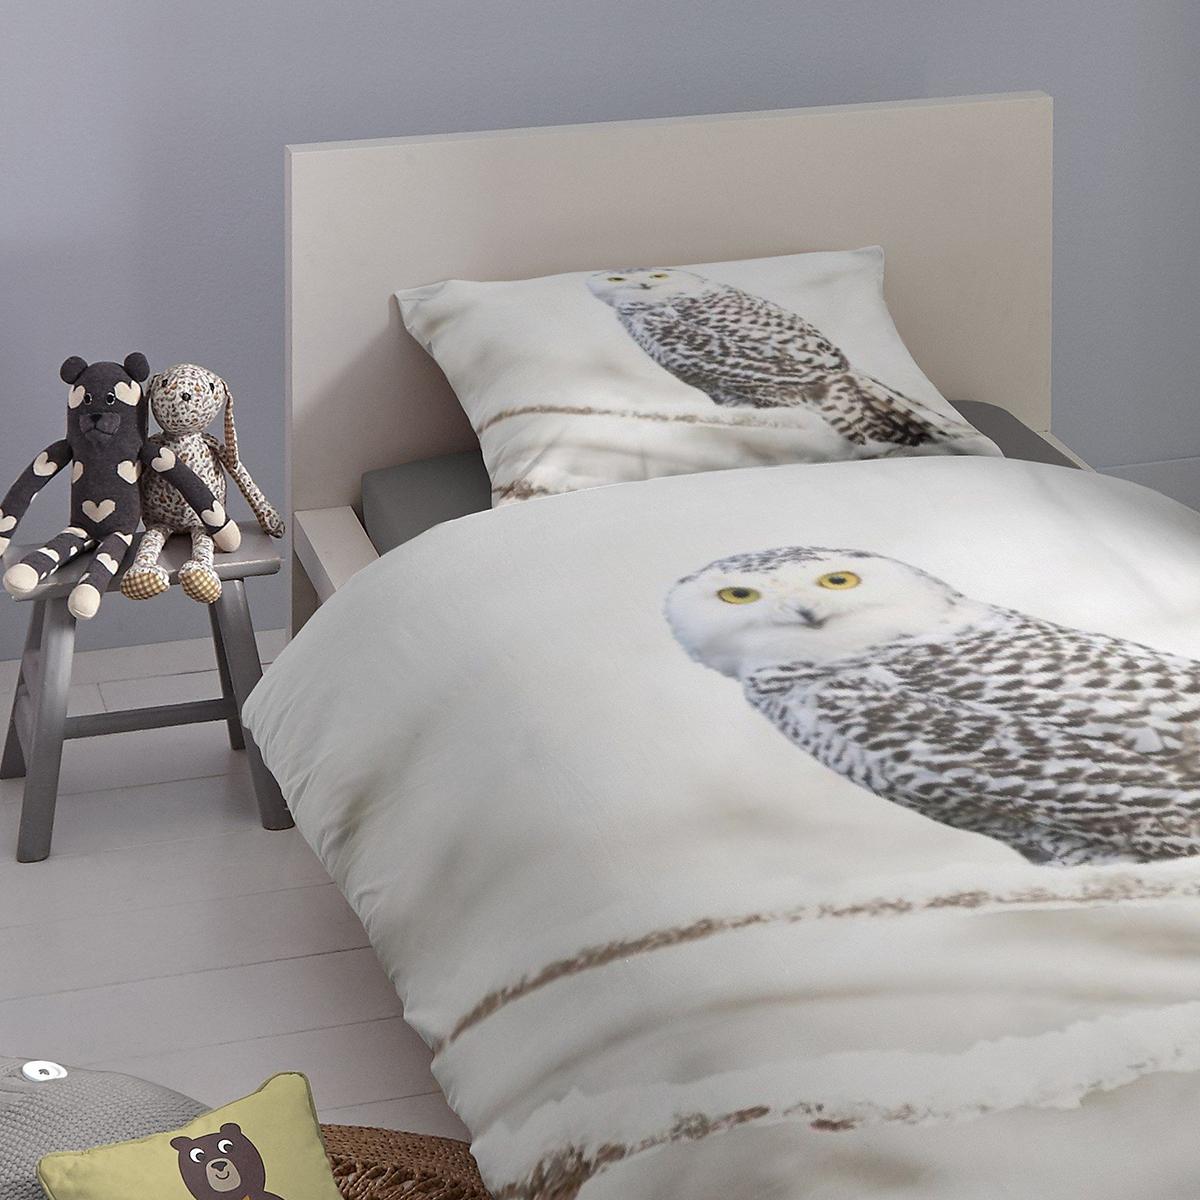 good morning flanell bettw sche eule g nstig online kaufen bei bettwaren shop. Black Bedroom Furniture Sets. Home Design Ideas